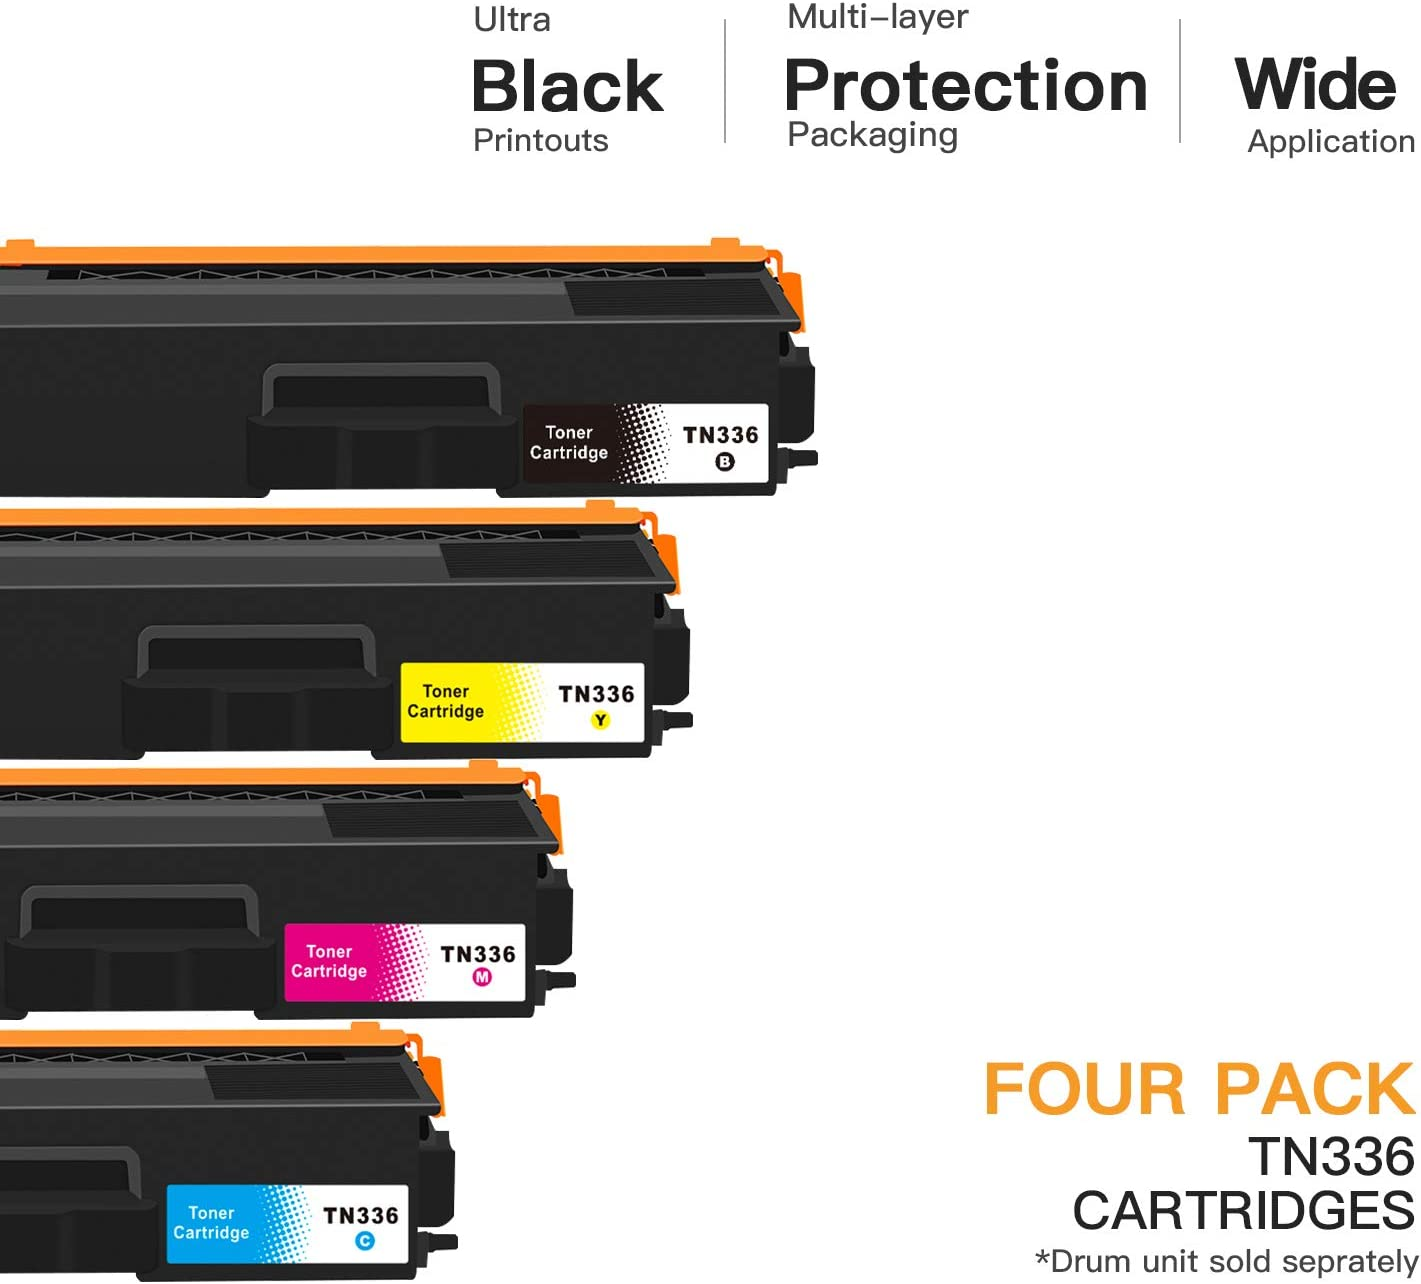 1 Black 1 Magenta Purpplex New Compatible tn331hy High Yield Toner Cartridge for HL-L8250CDN HL-L8350CDW HL-L8350CDWT Printers 1 Yellow 1 Cyan